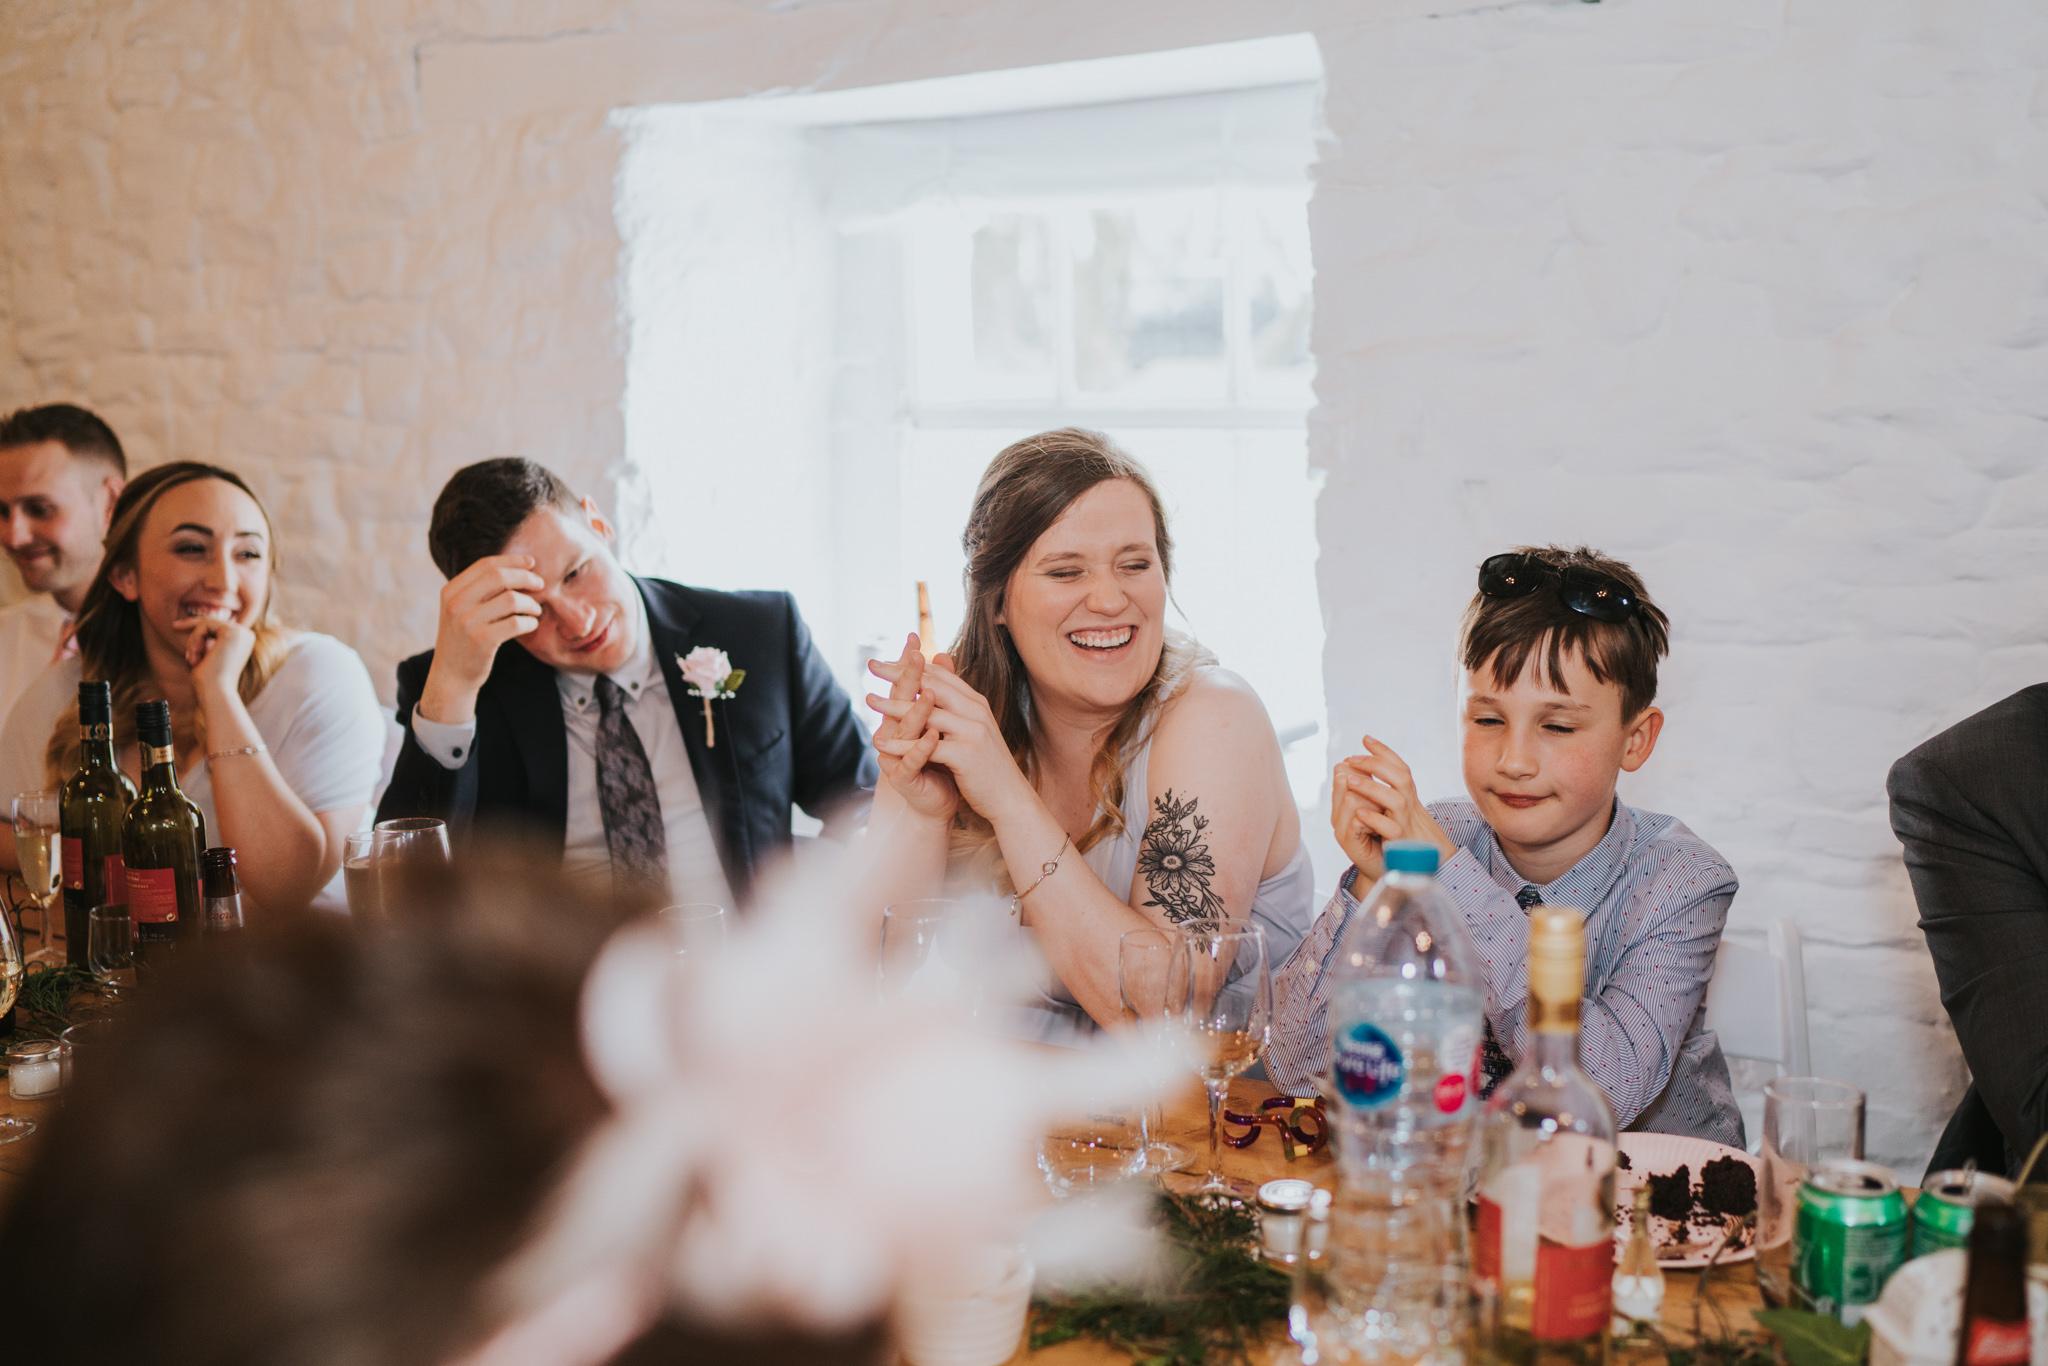 grace-sam-old-barn-clovelly-devon-wedding-photographer-grace-elizabeth-essex-suffolk-norfolk-wedding-photographer (88 of 132).jpg